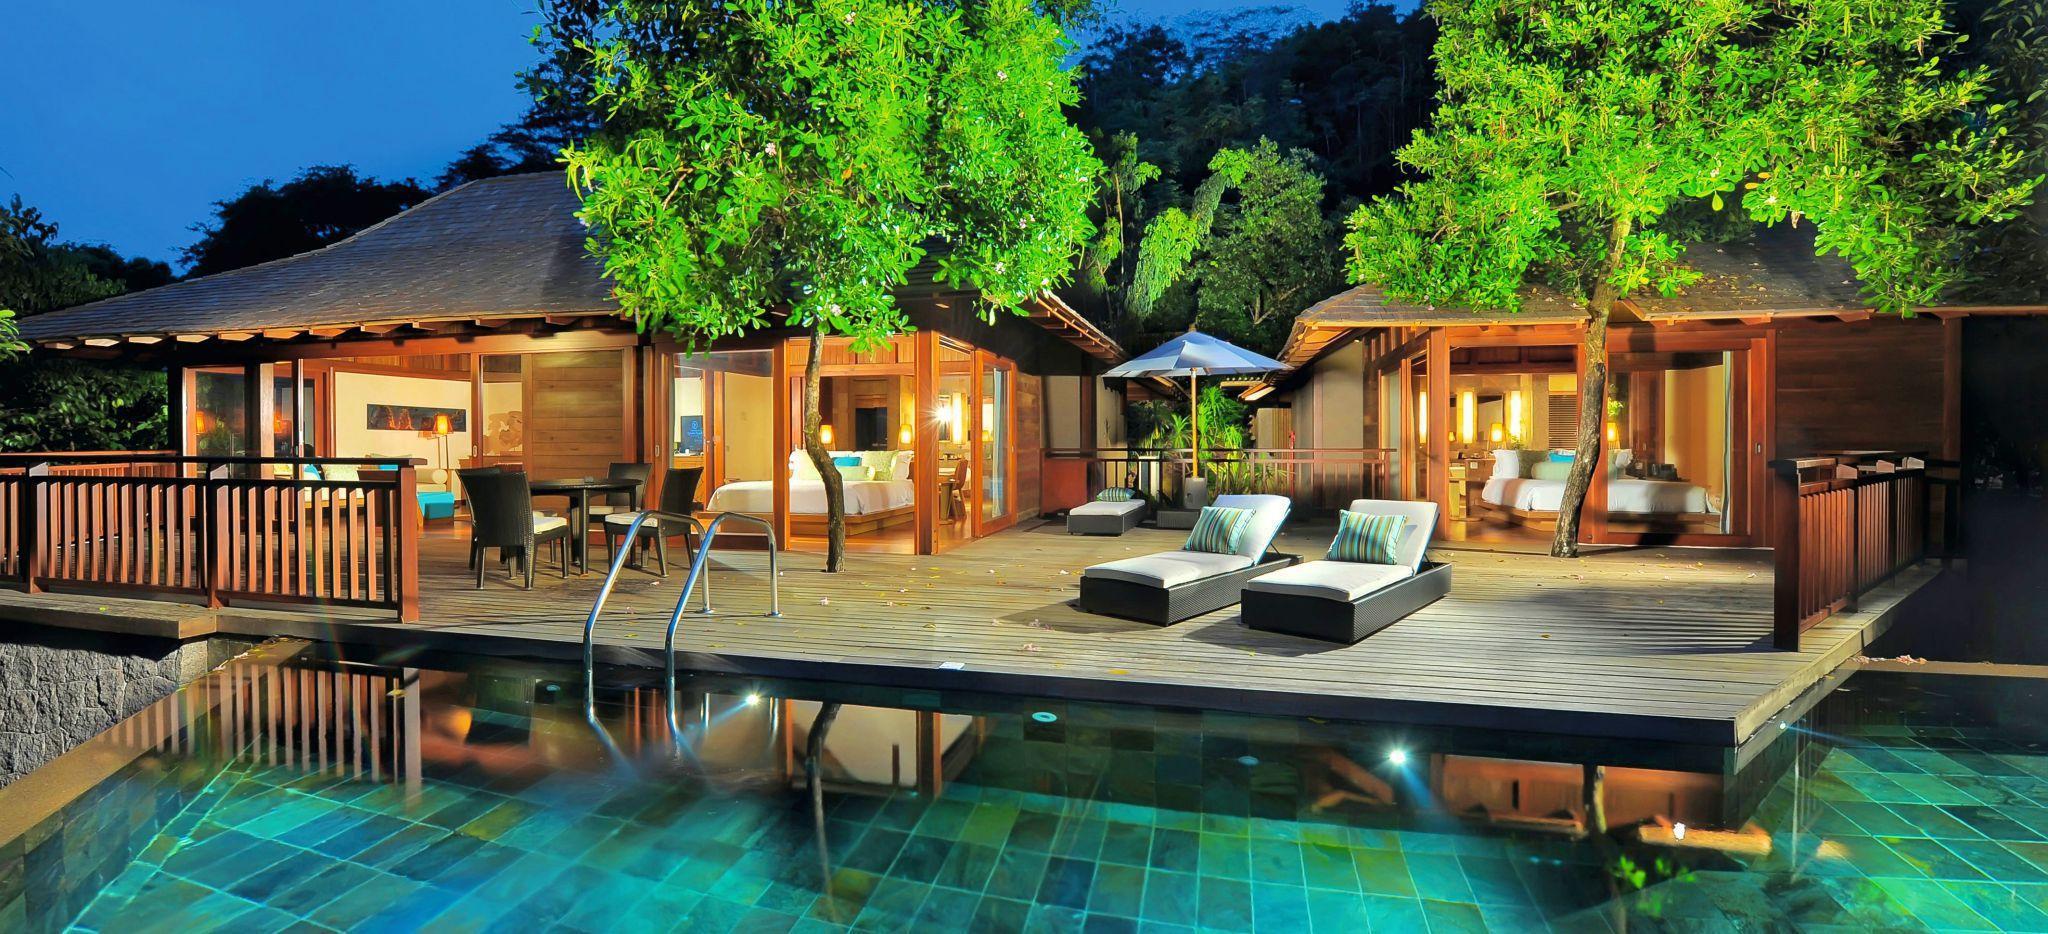 Terrasse und privater Pool